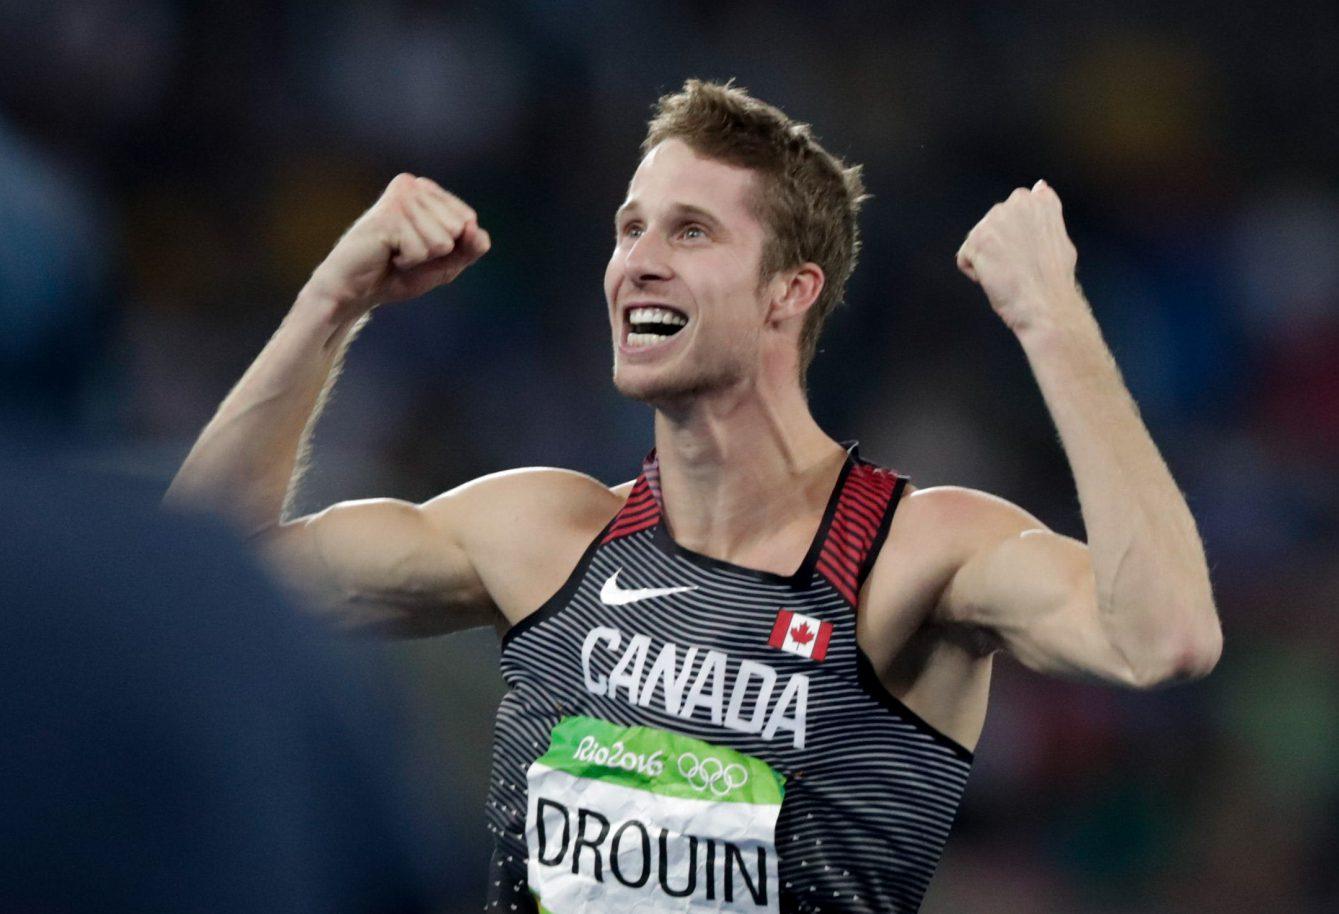 Rio 2016: Derek Drouin celebrates his Olympic gold medal on August 16, 2016 (Jason Ransom/COC).